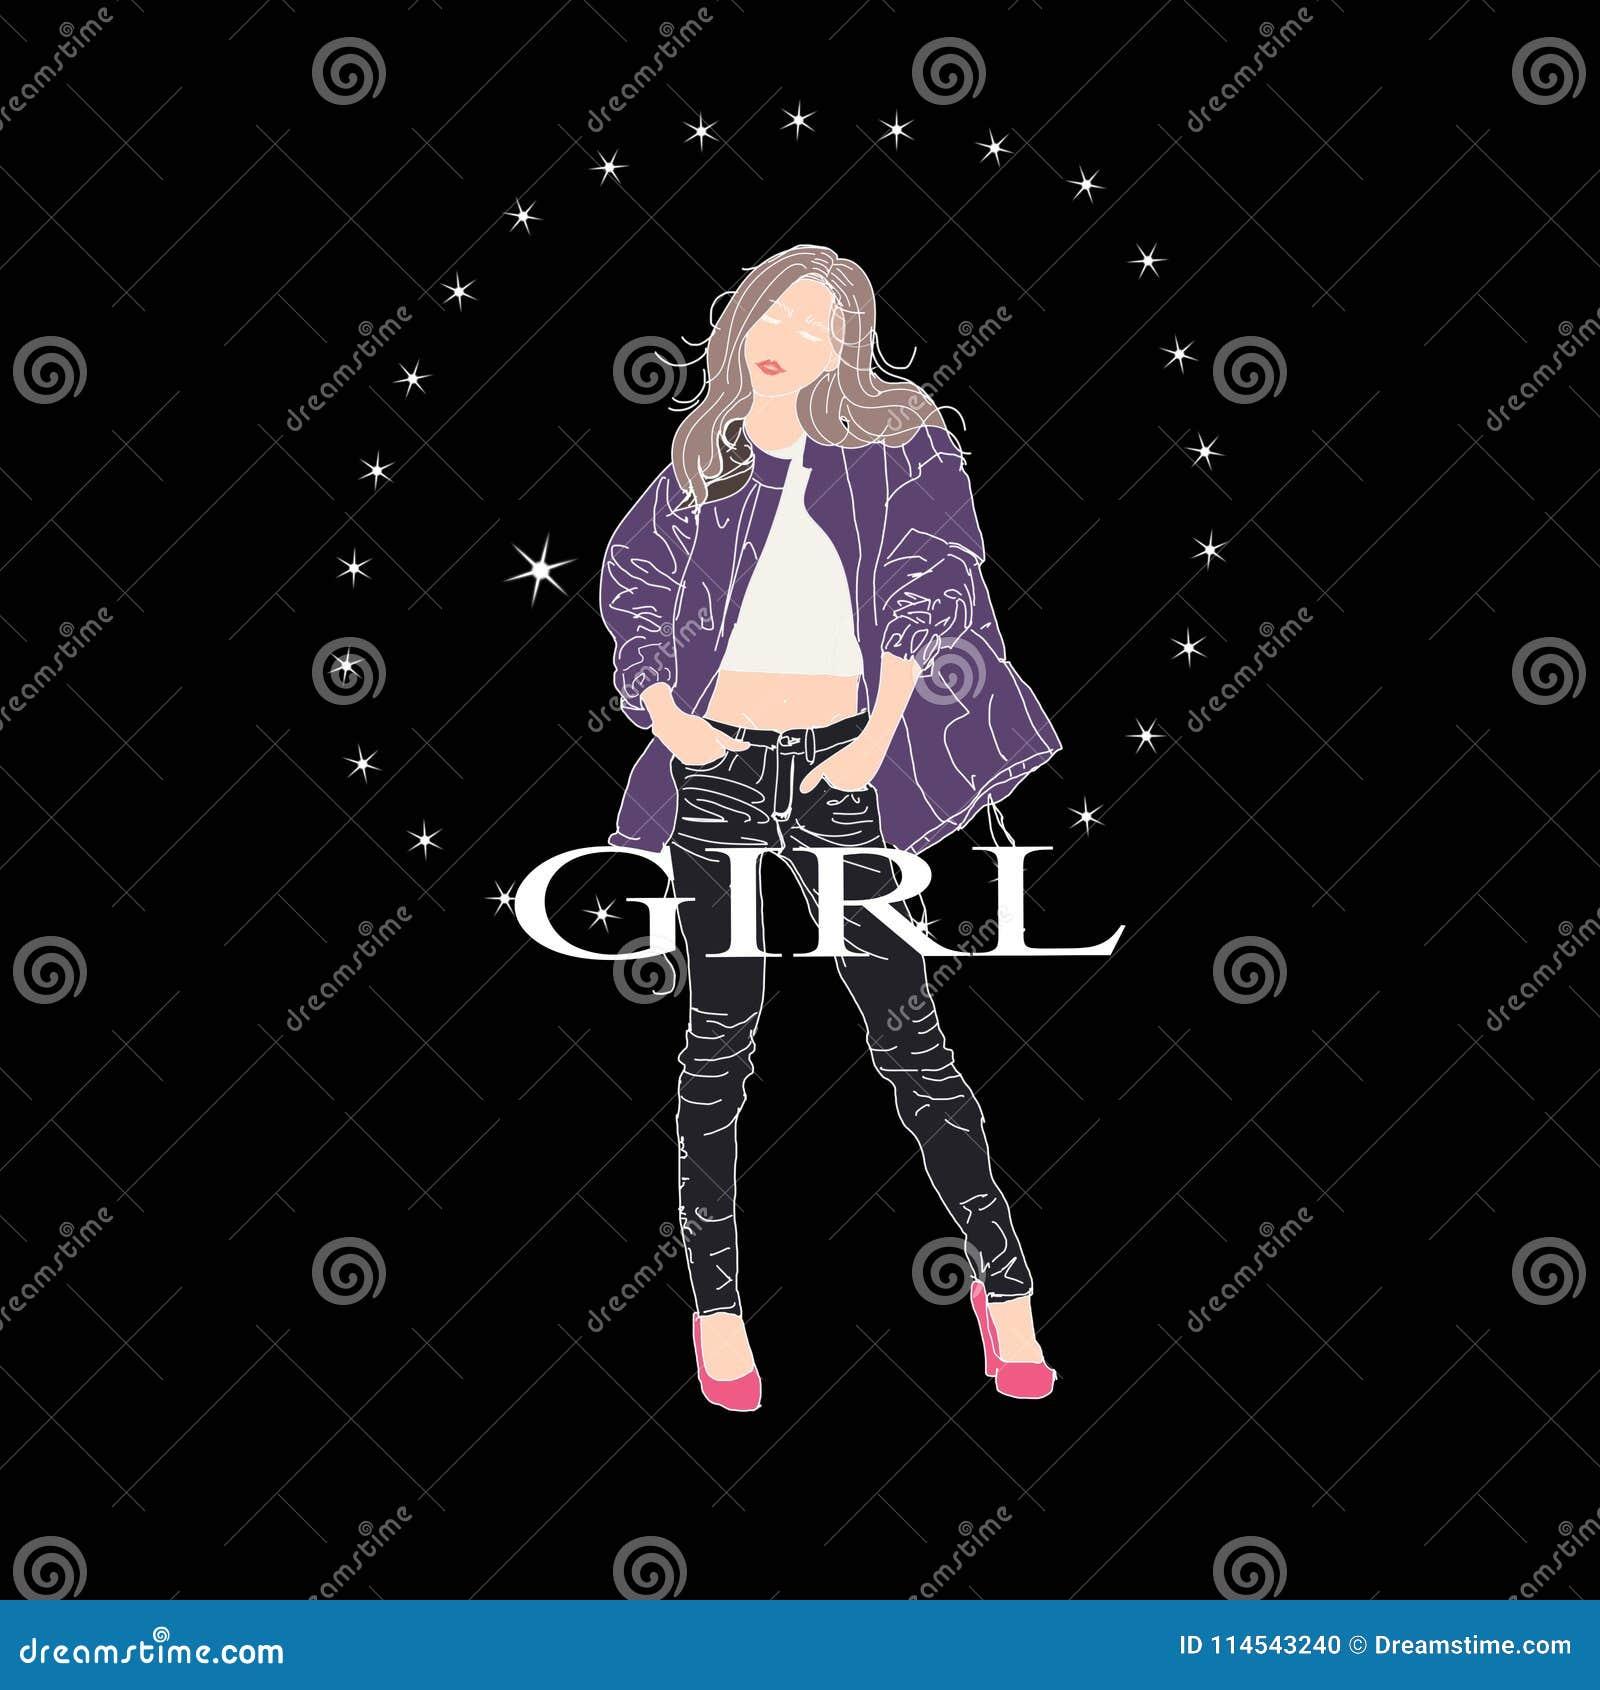 Girl girl girl hunting lesbian lesbian